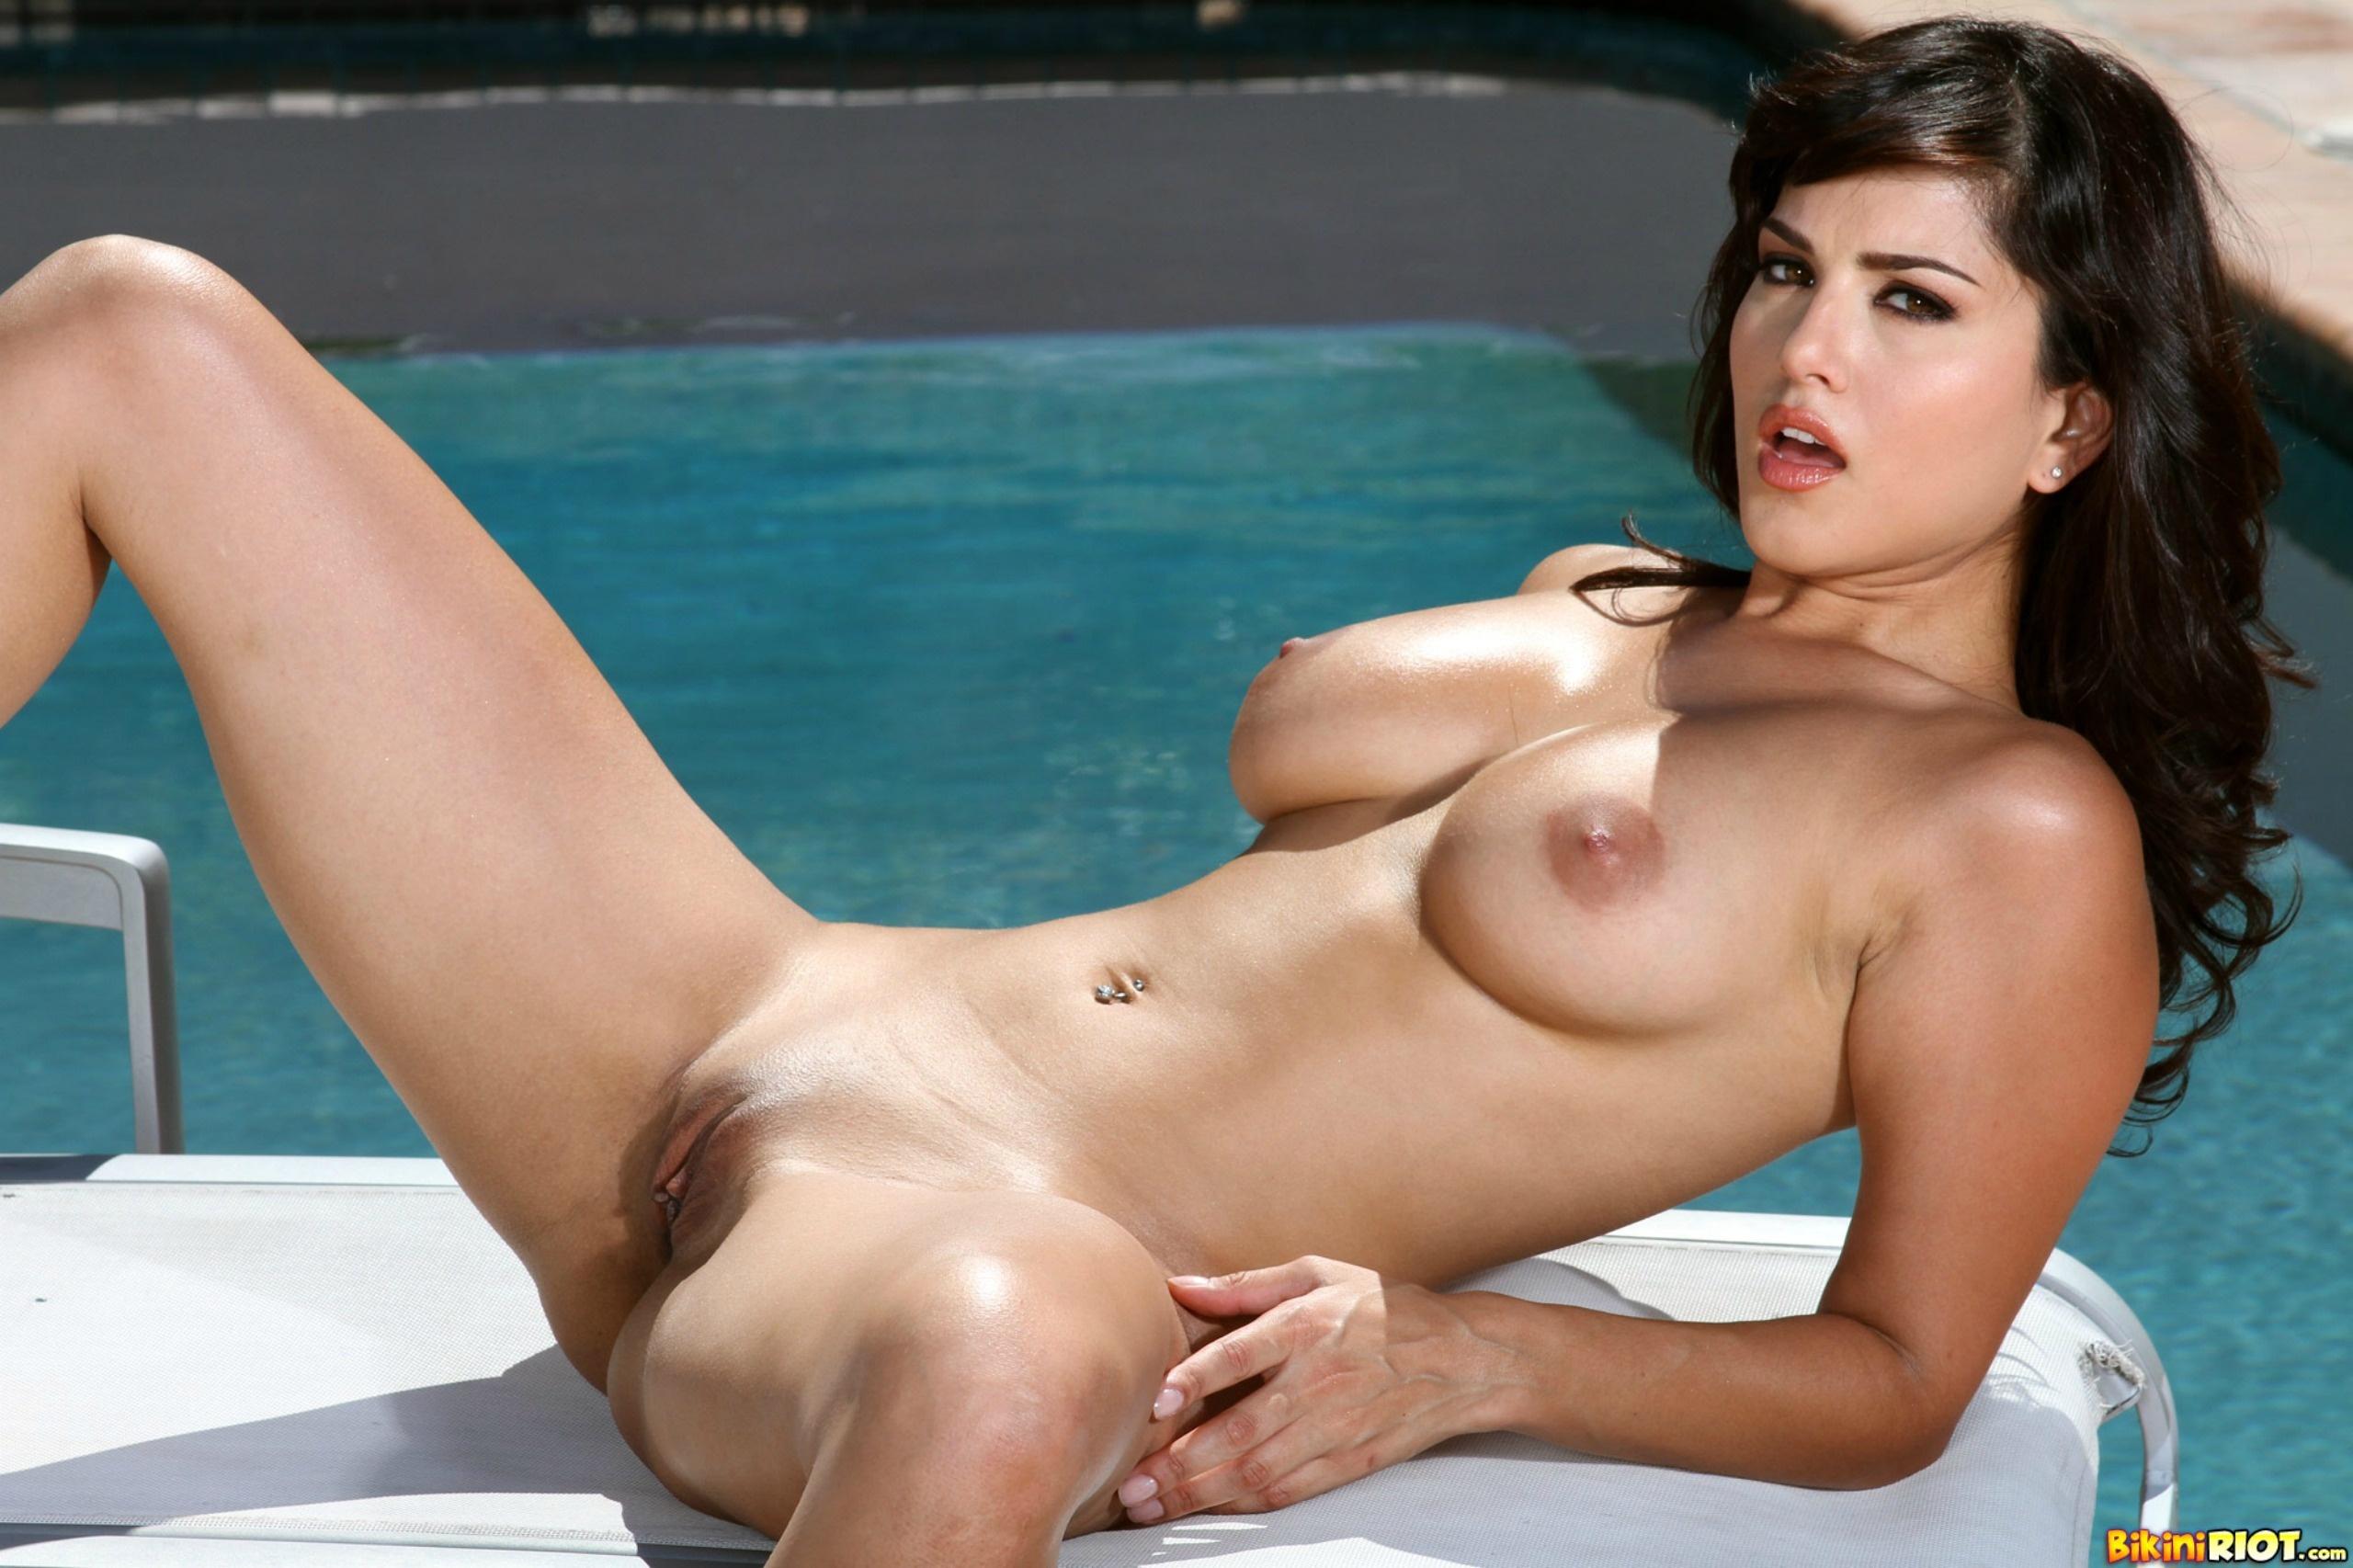 Consider, sunny leone boobs nipples have